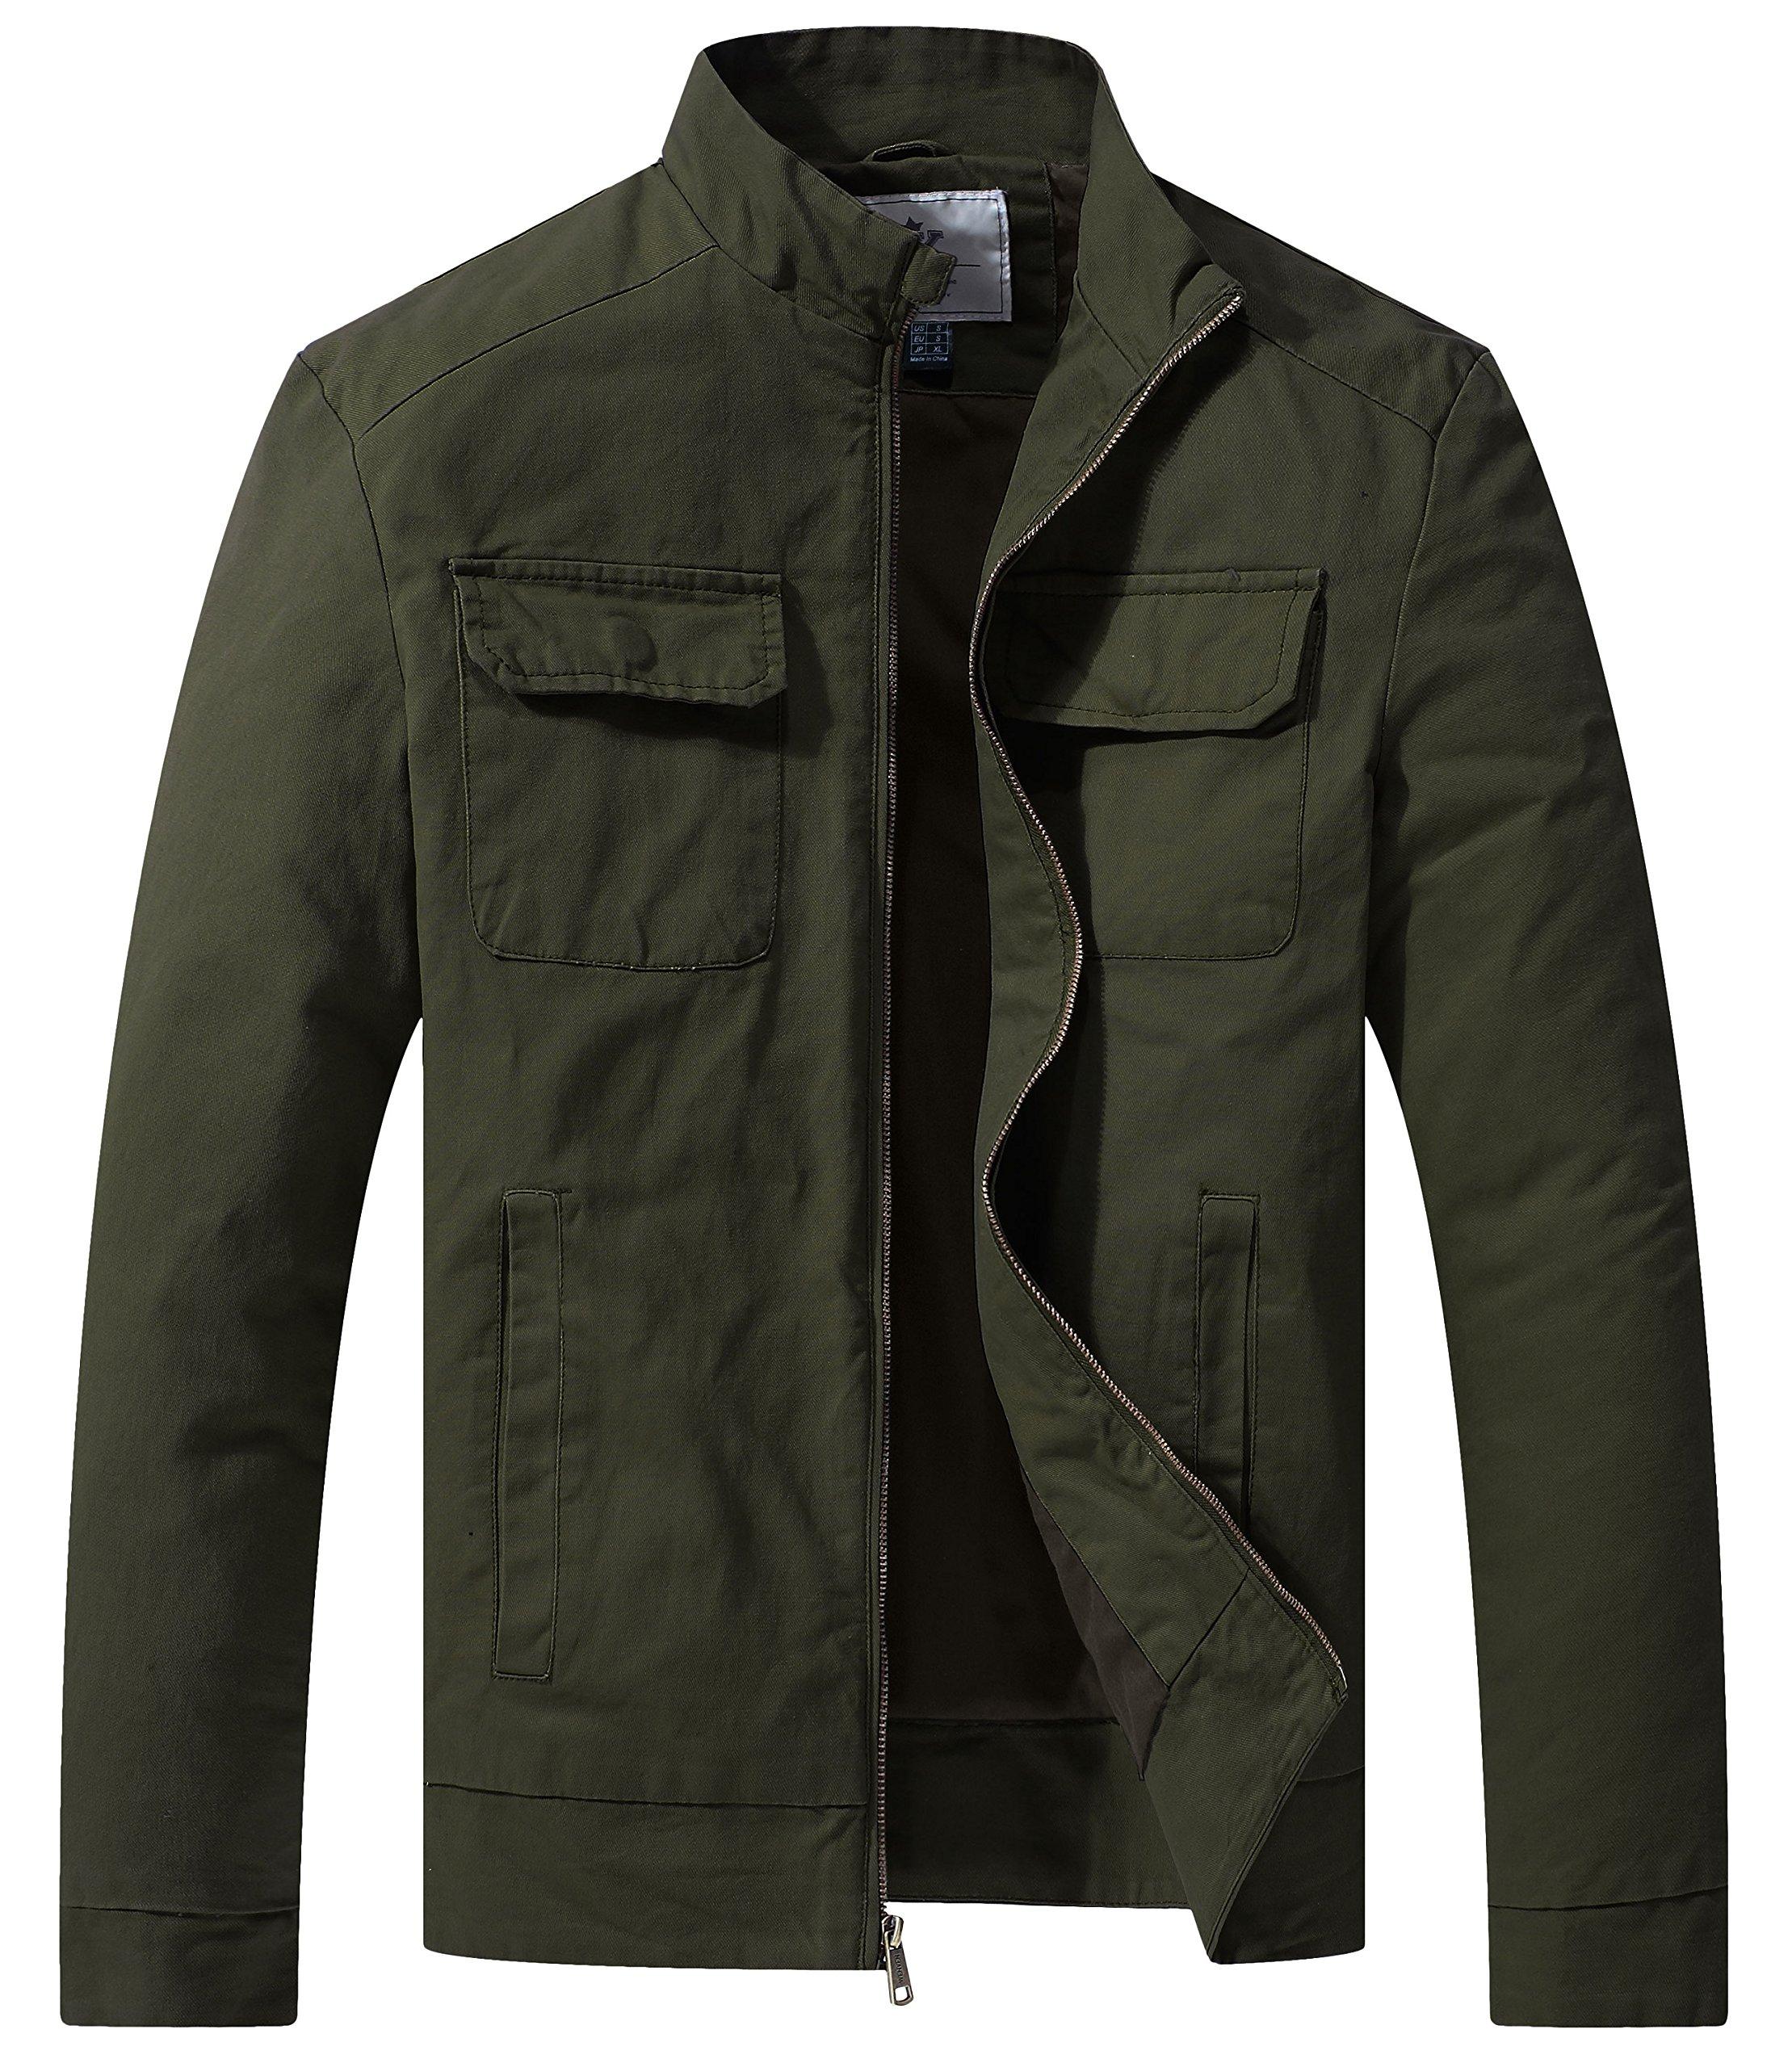 WenVen Men's Fall Casual Army Lightweight Jacket(Army Green,Medium)